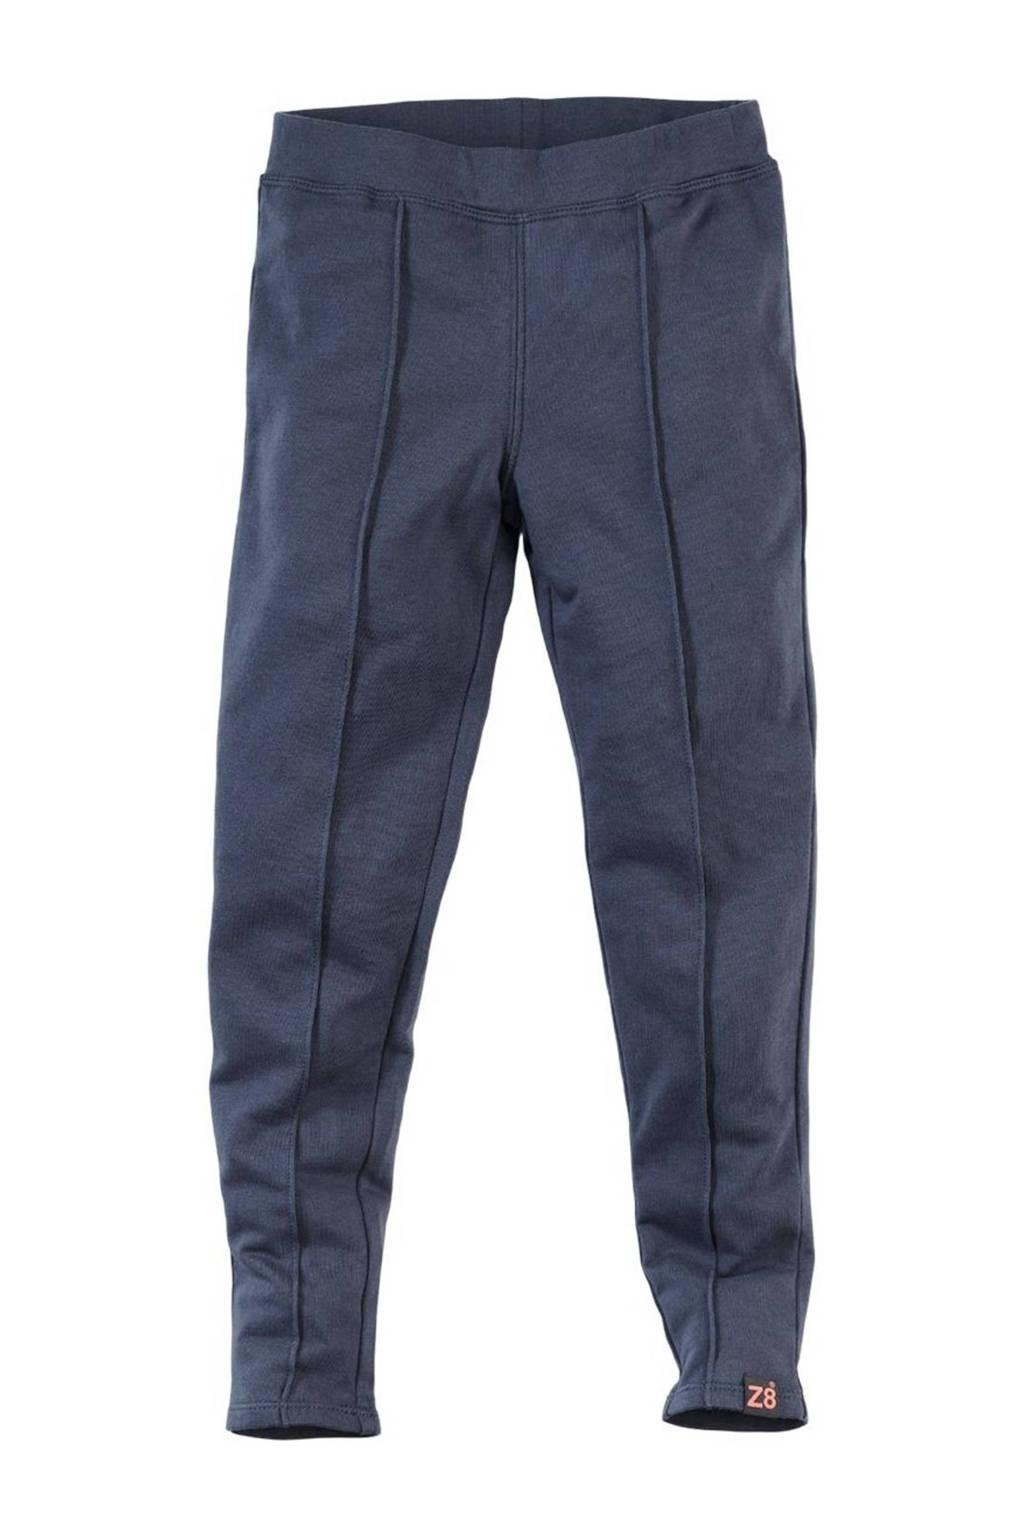 Z8 legging Harper W22 donkerblauw, Donkerblauw